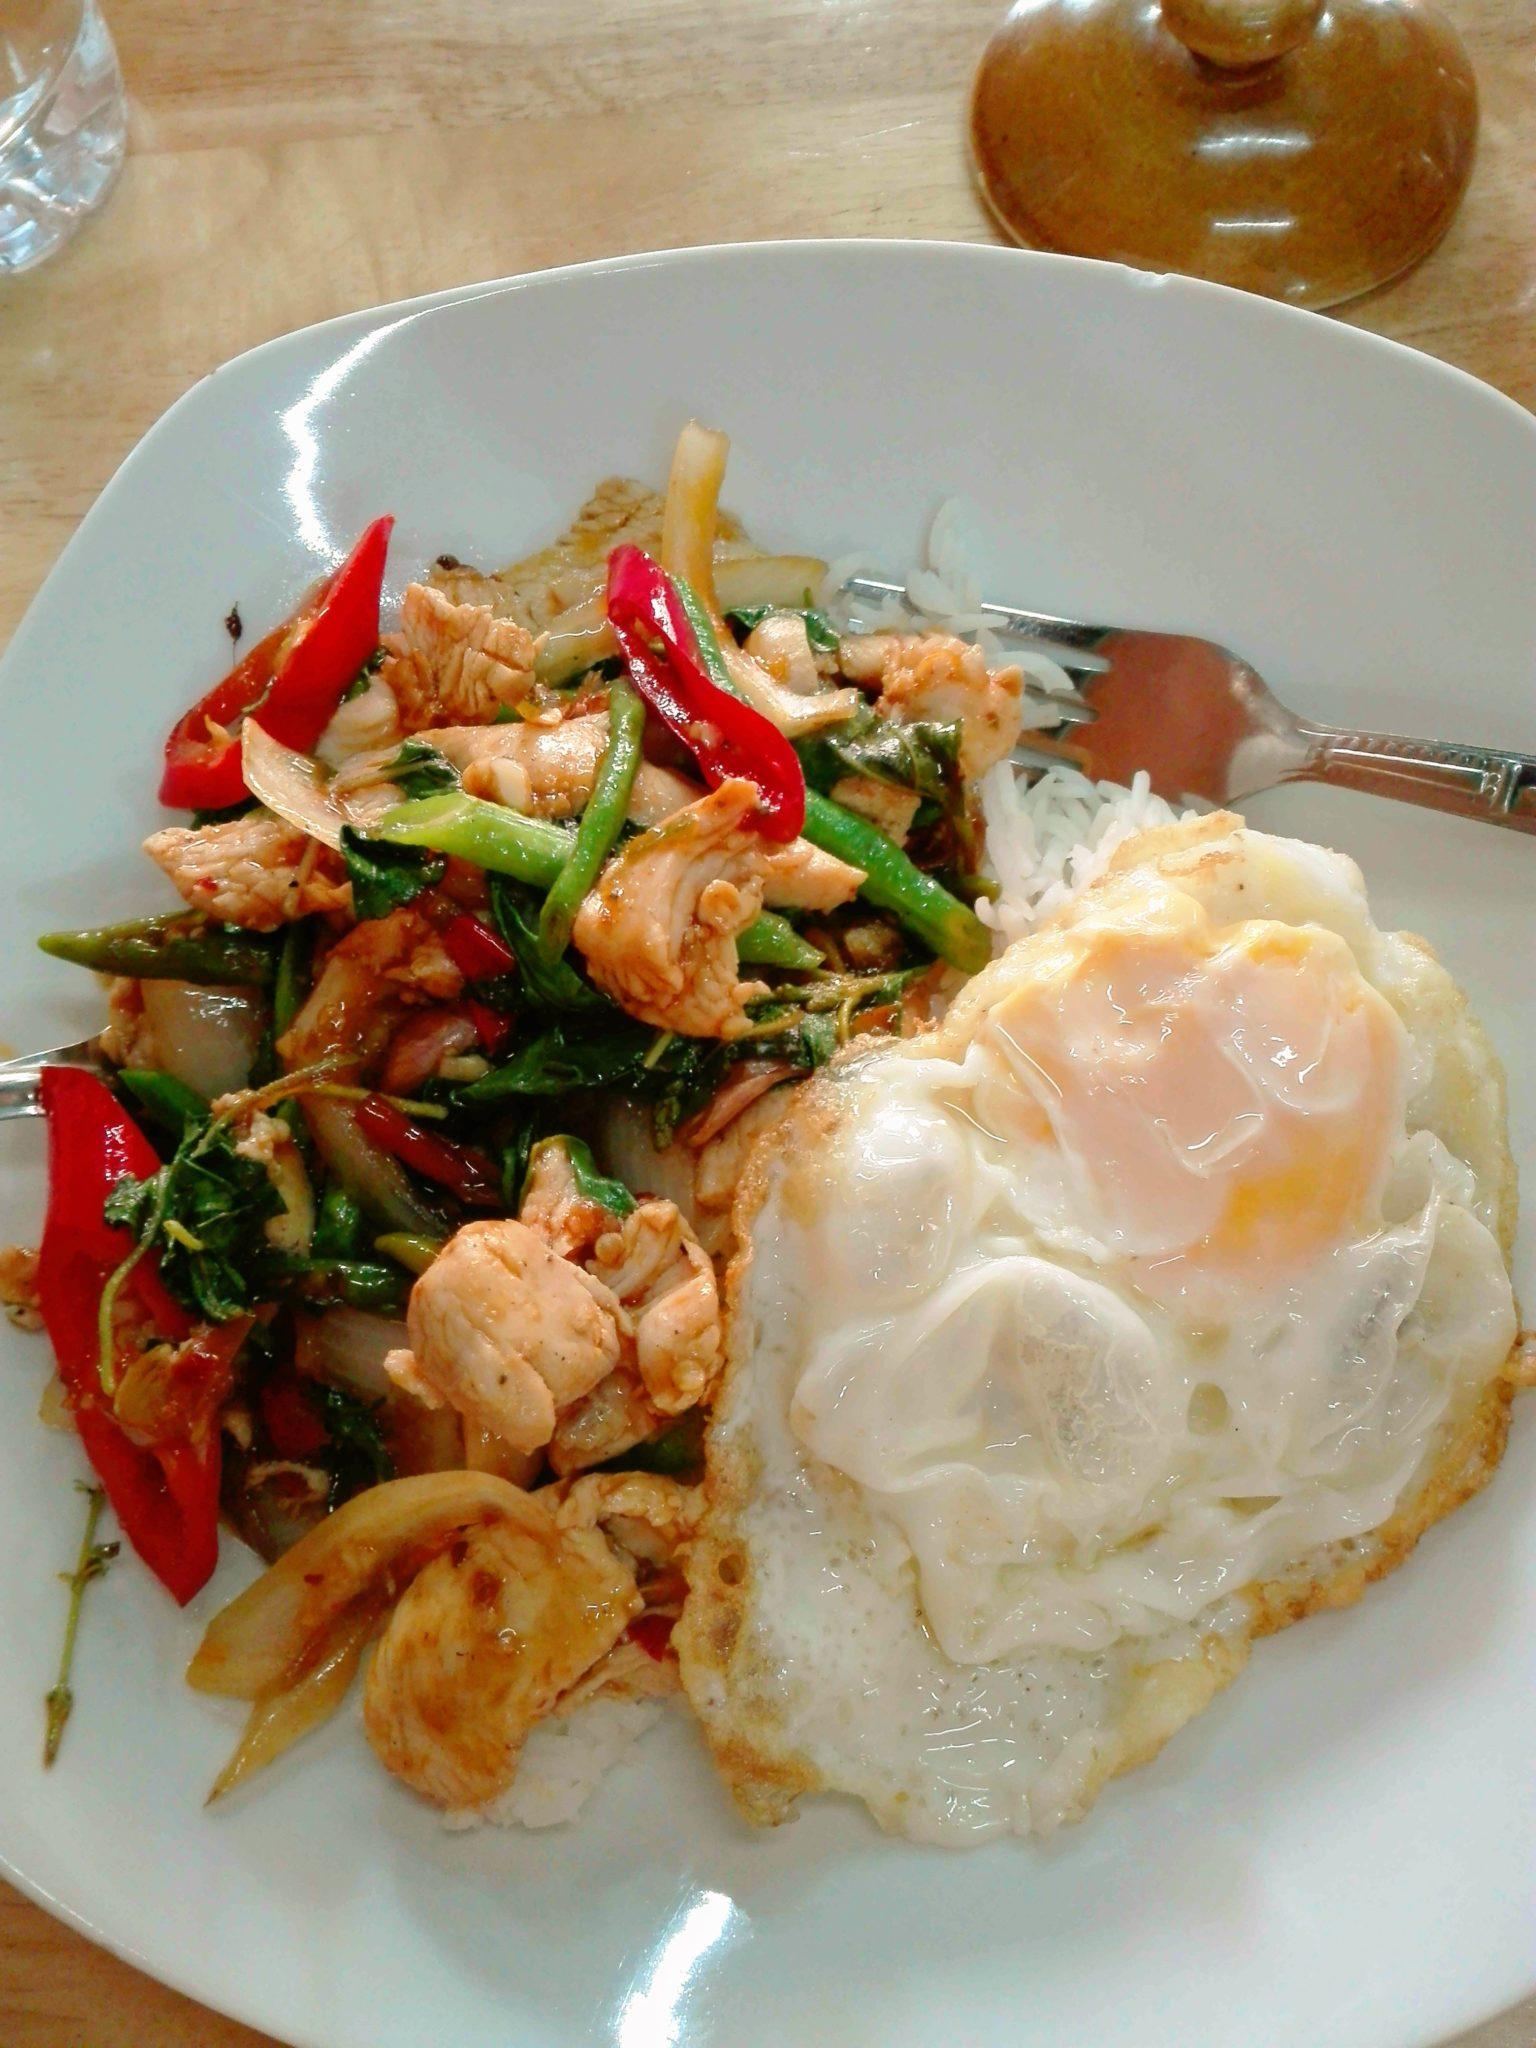 Pad krapow recipe thai stir fry basil forumfinder Image collections